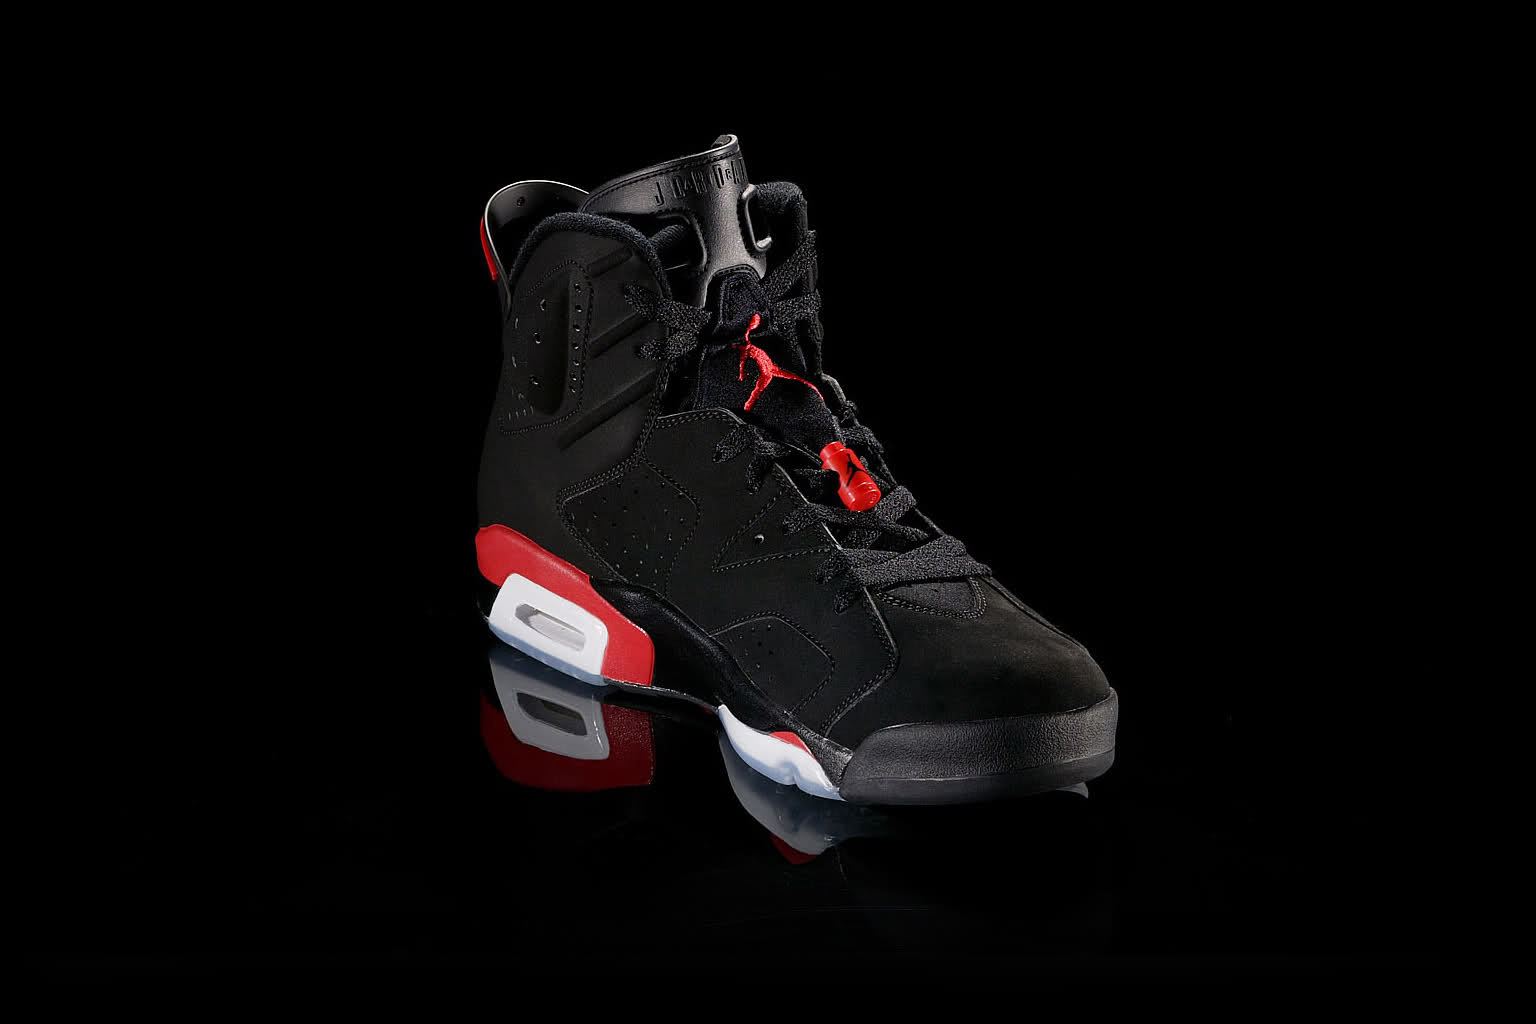 fc2857ed30bba5 Sneaker of the Day  The Return Of The Air Jordan 6 Retro